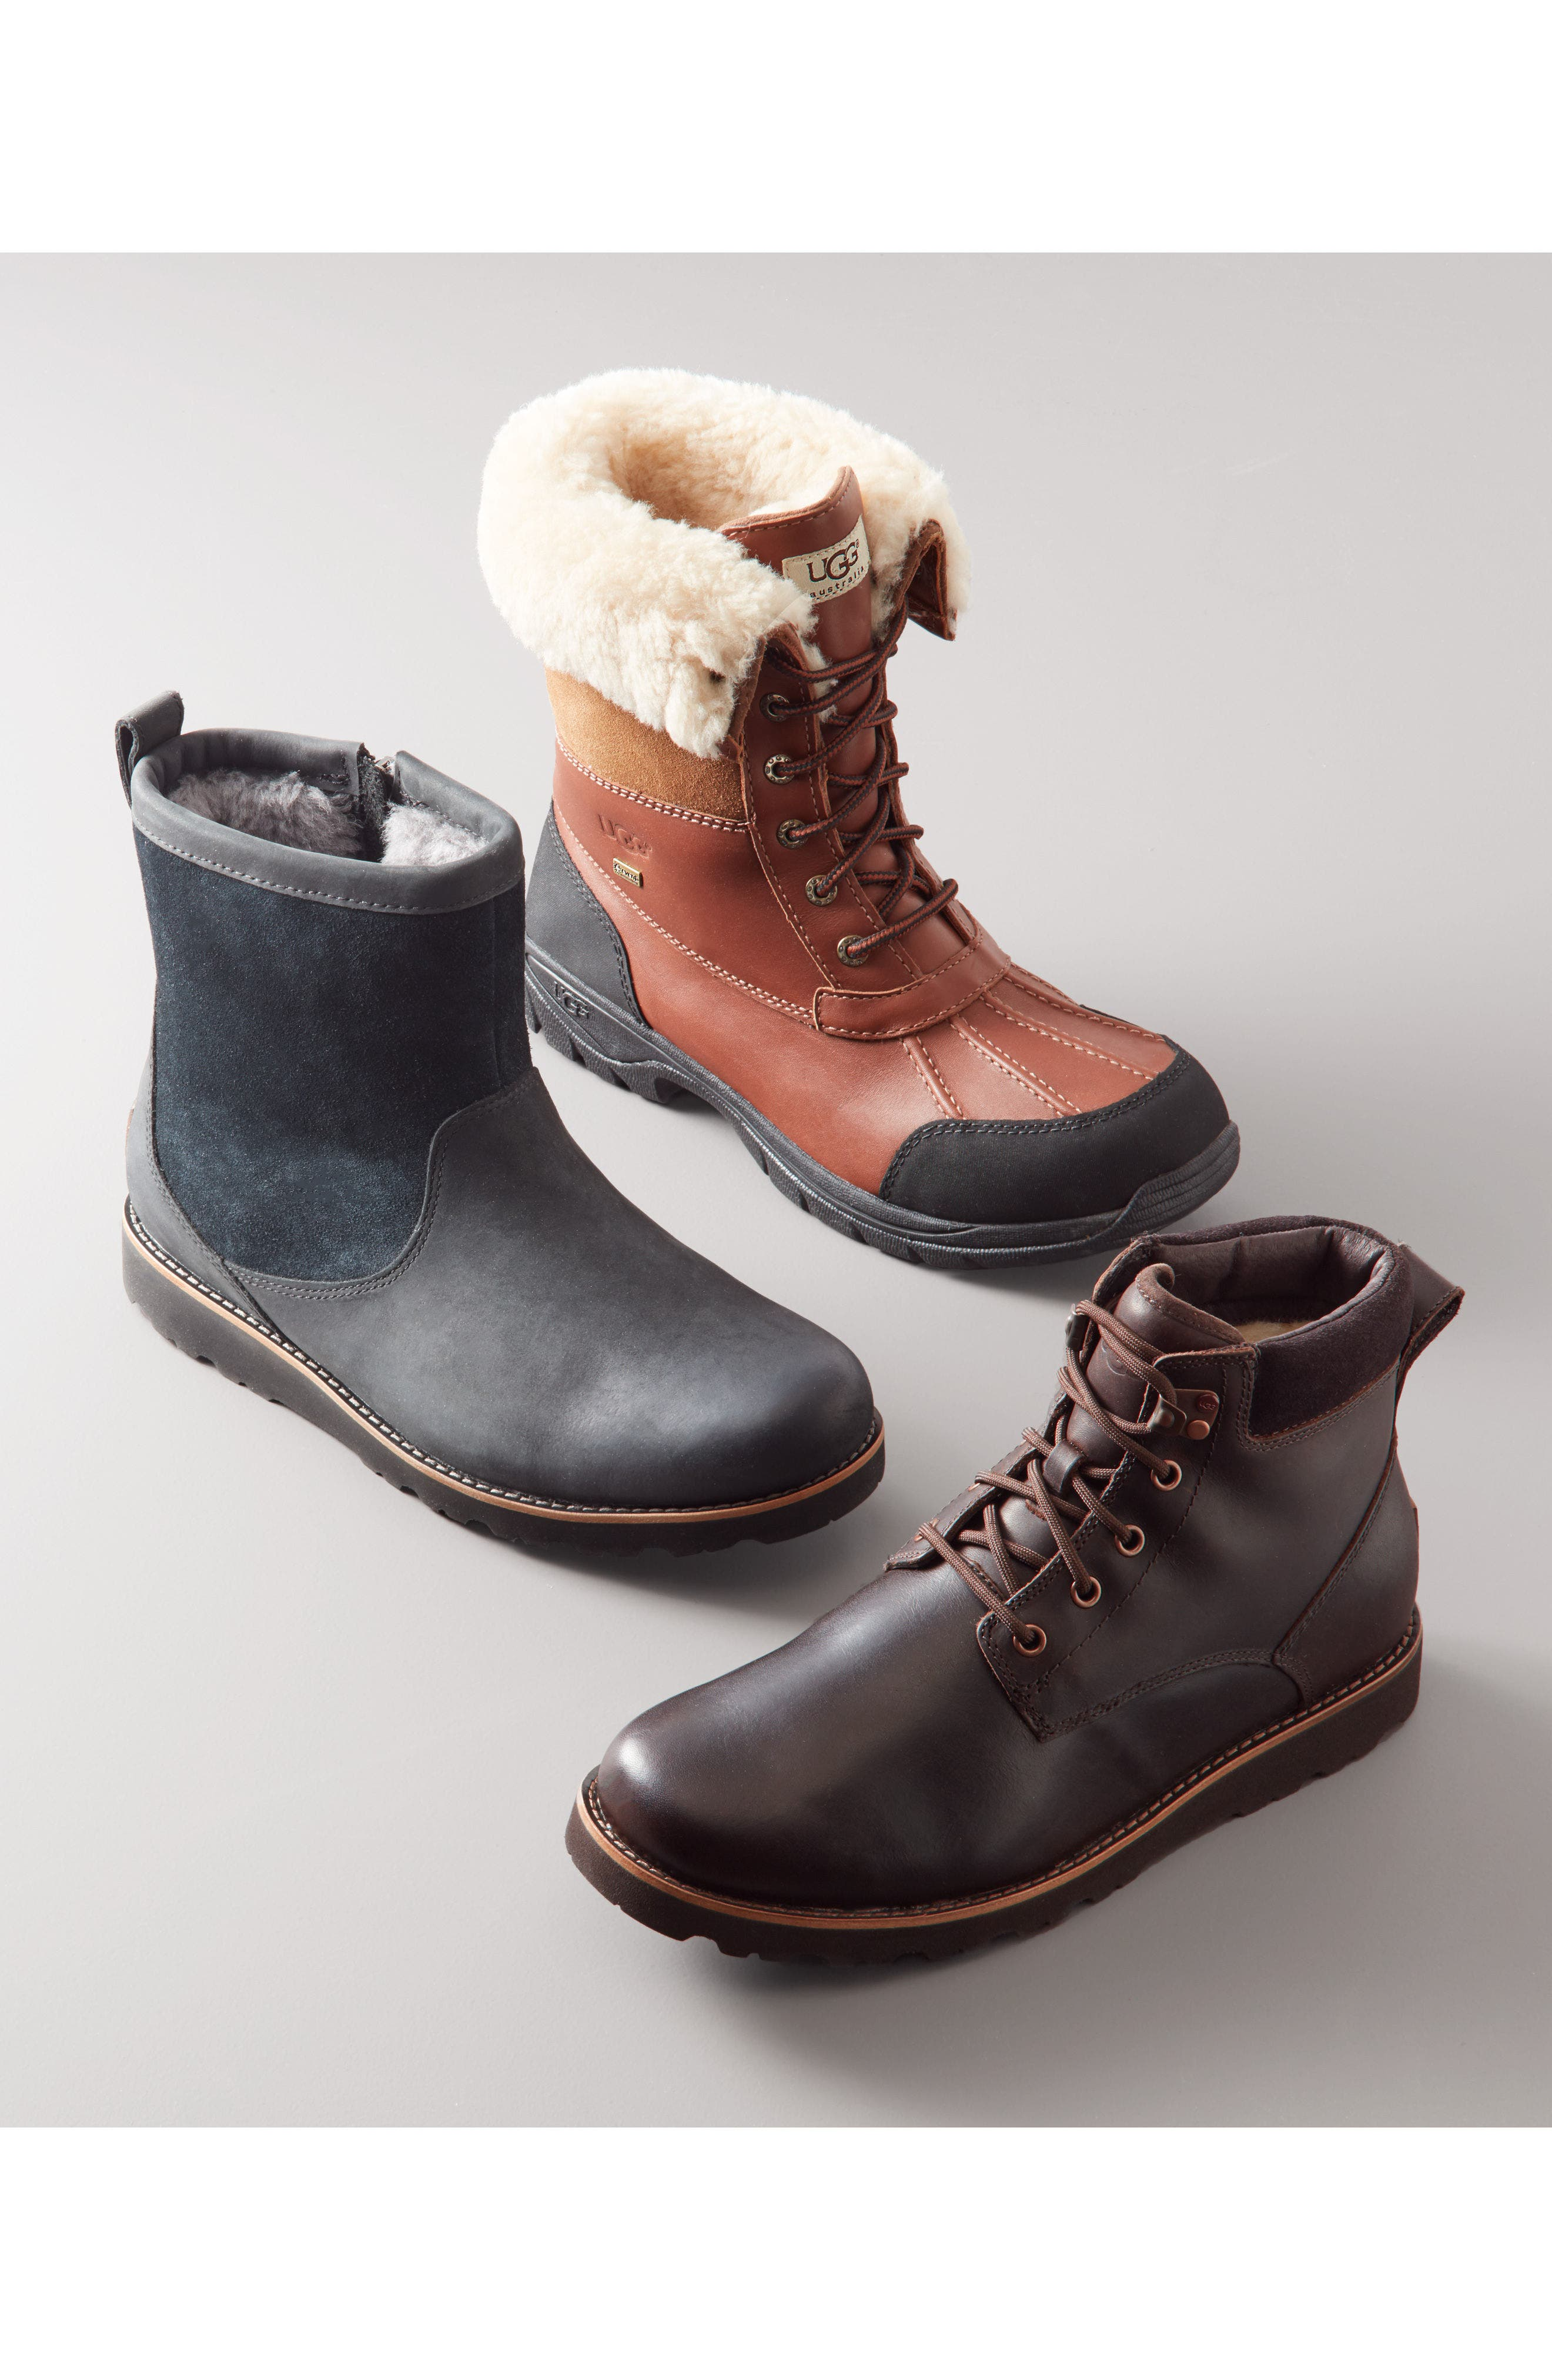 Seton Waterproof Chukka Boot,                             Alternate thumbnail 10, color,                             WHEAT